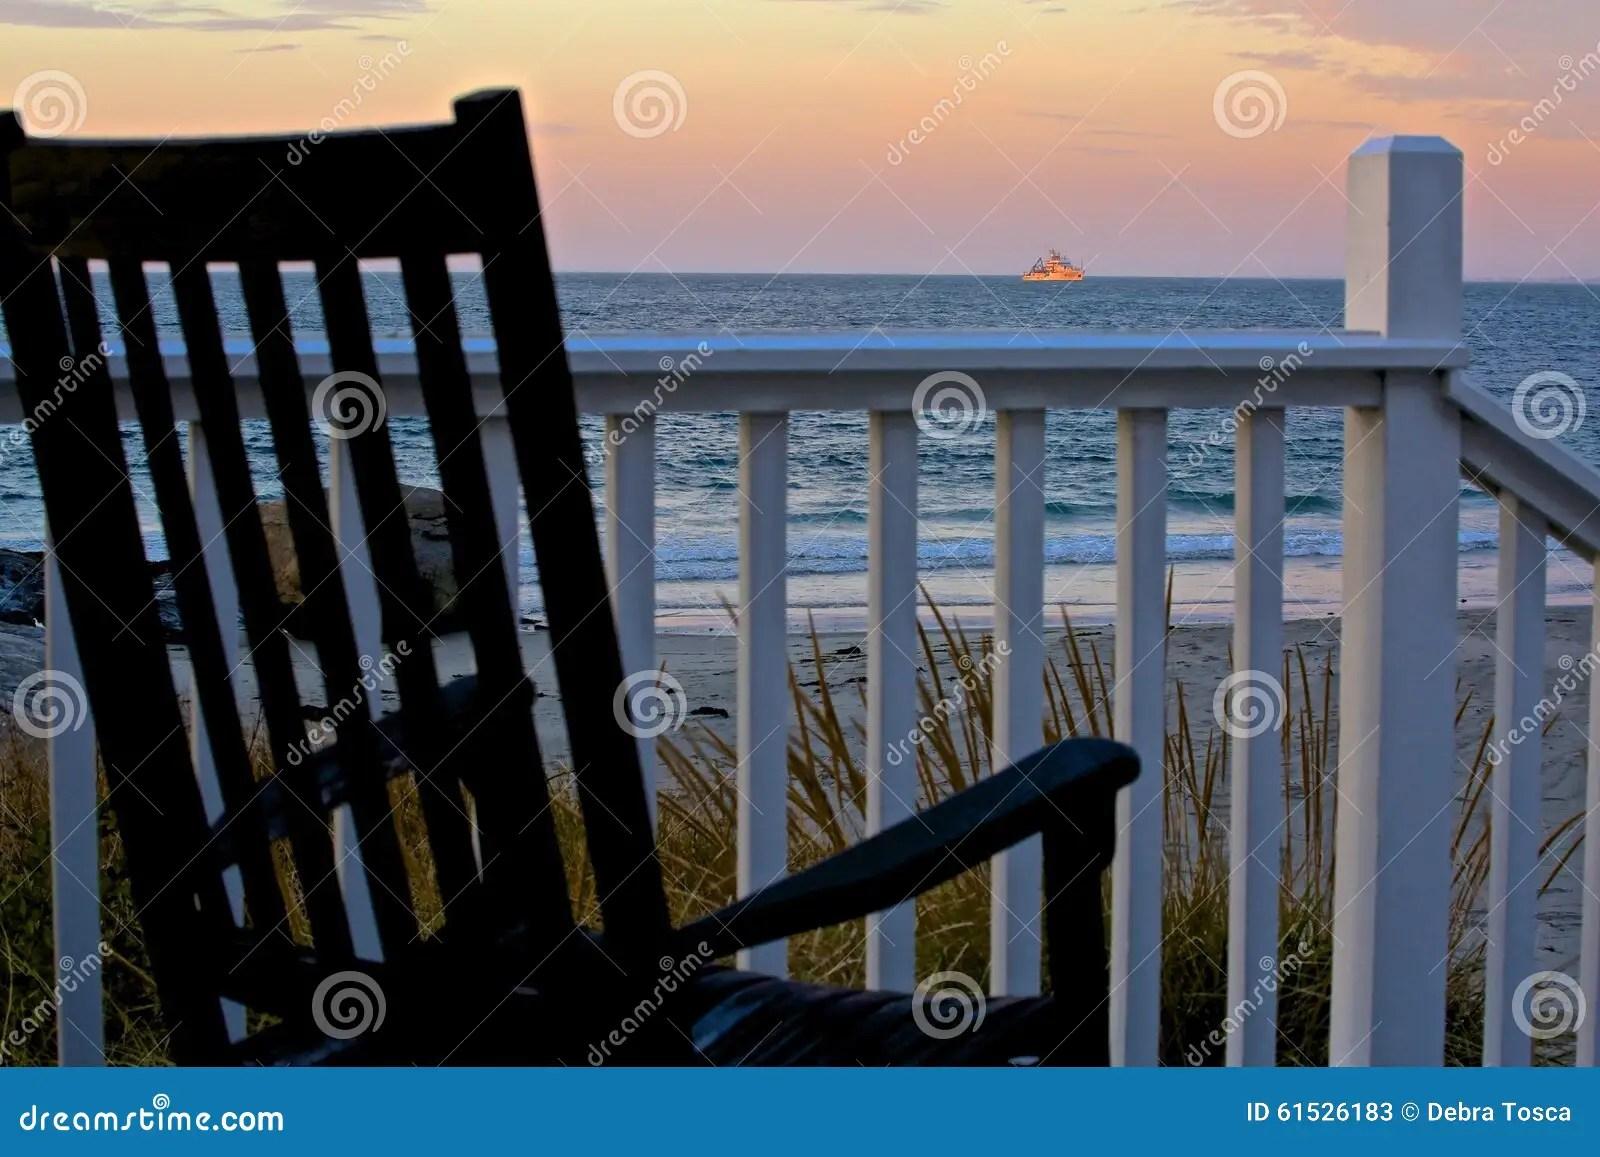 newport rocking chair sedan for sale boat ocean stock photo image 61526183